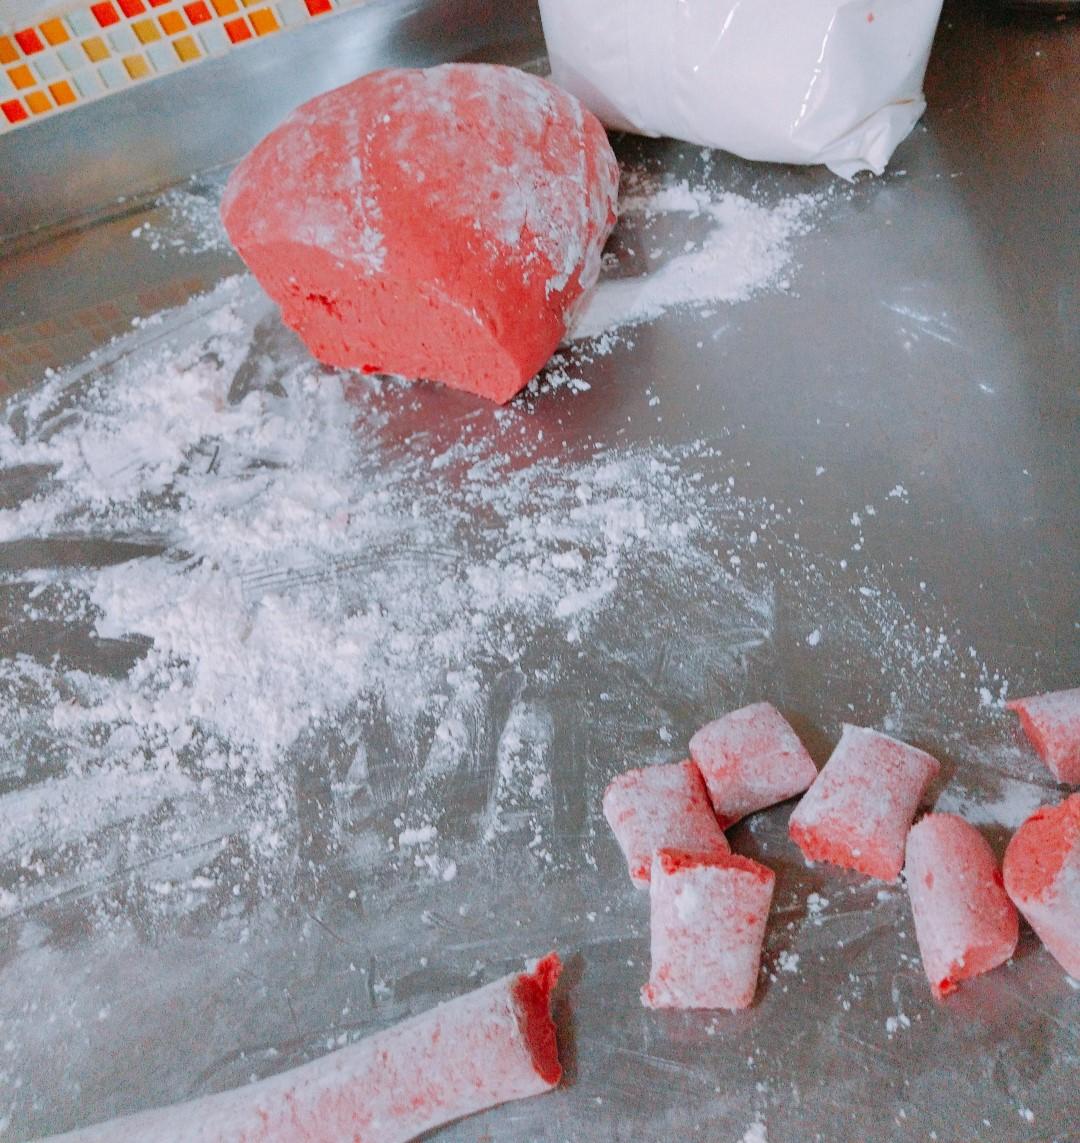 Cocina sin Gluten, con Daniela Engelbrecht: Tips de la cocina sin gluten